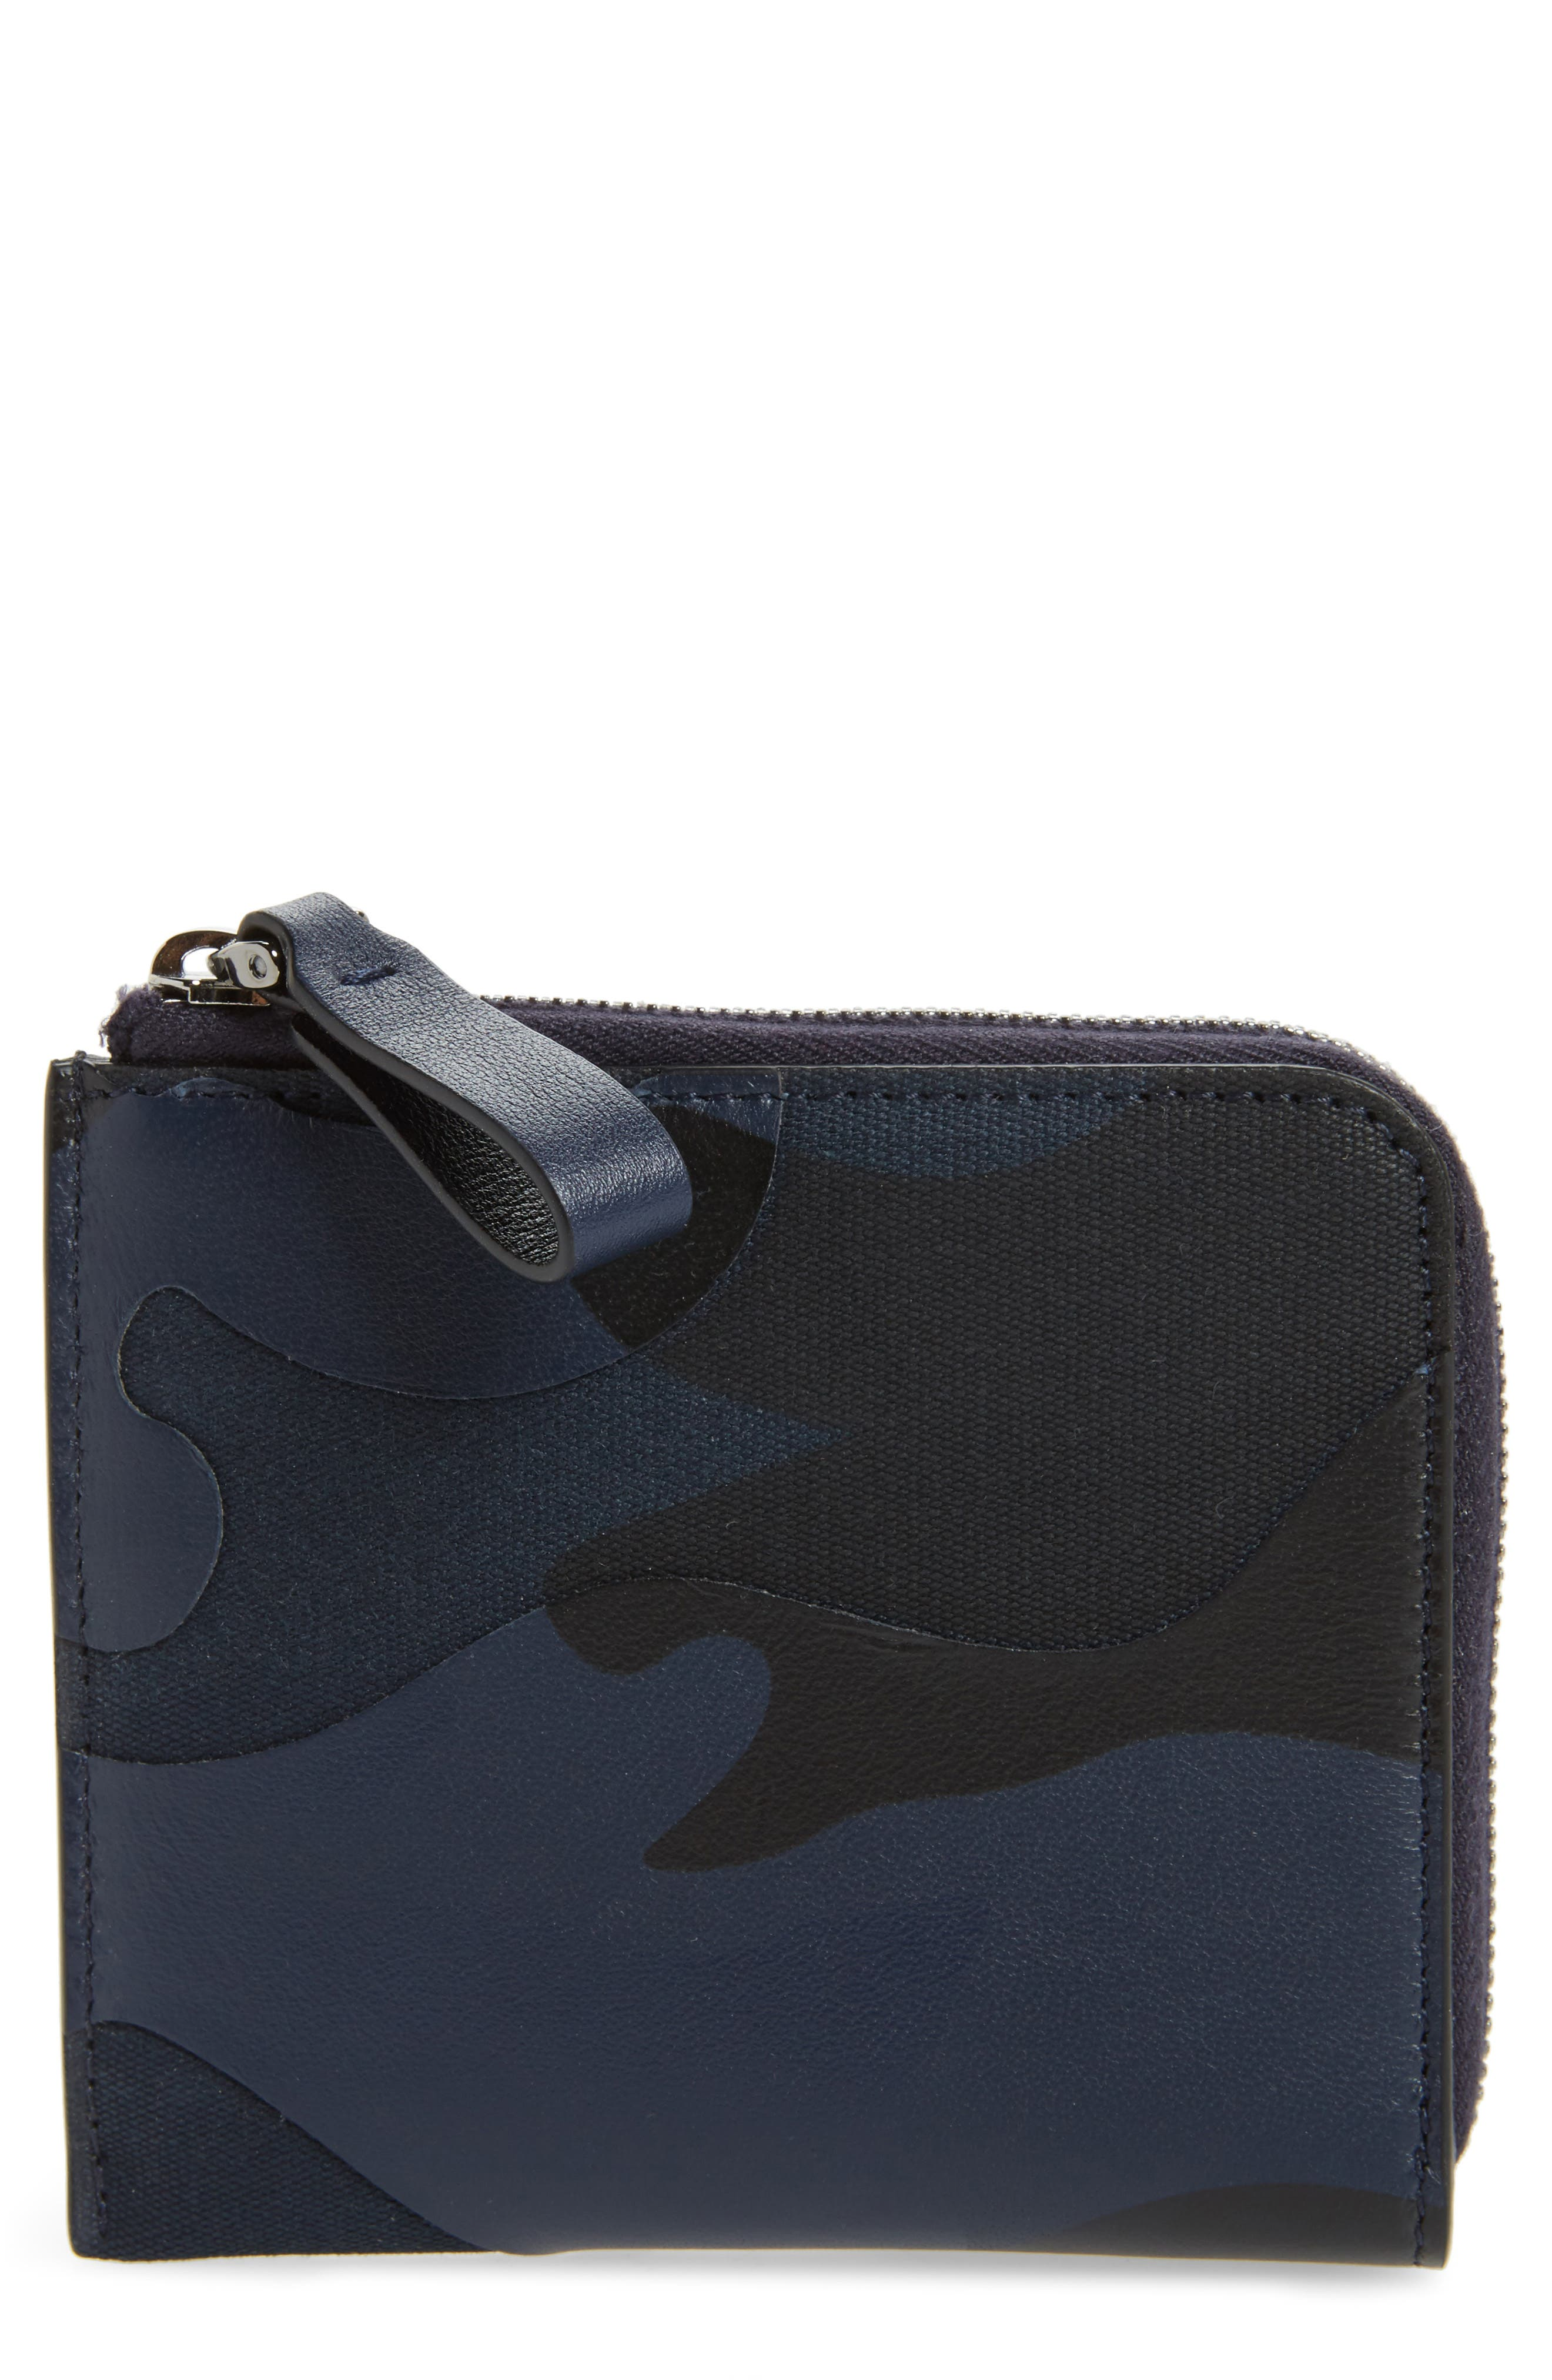 VALENTINO GARAVANI Camo Zip Wallet